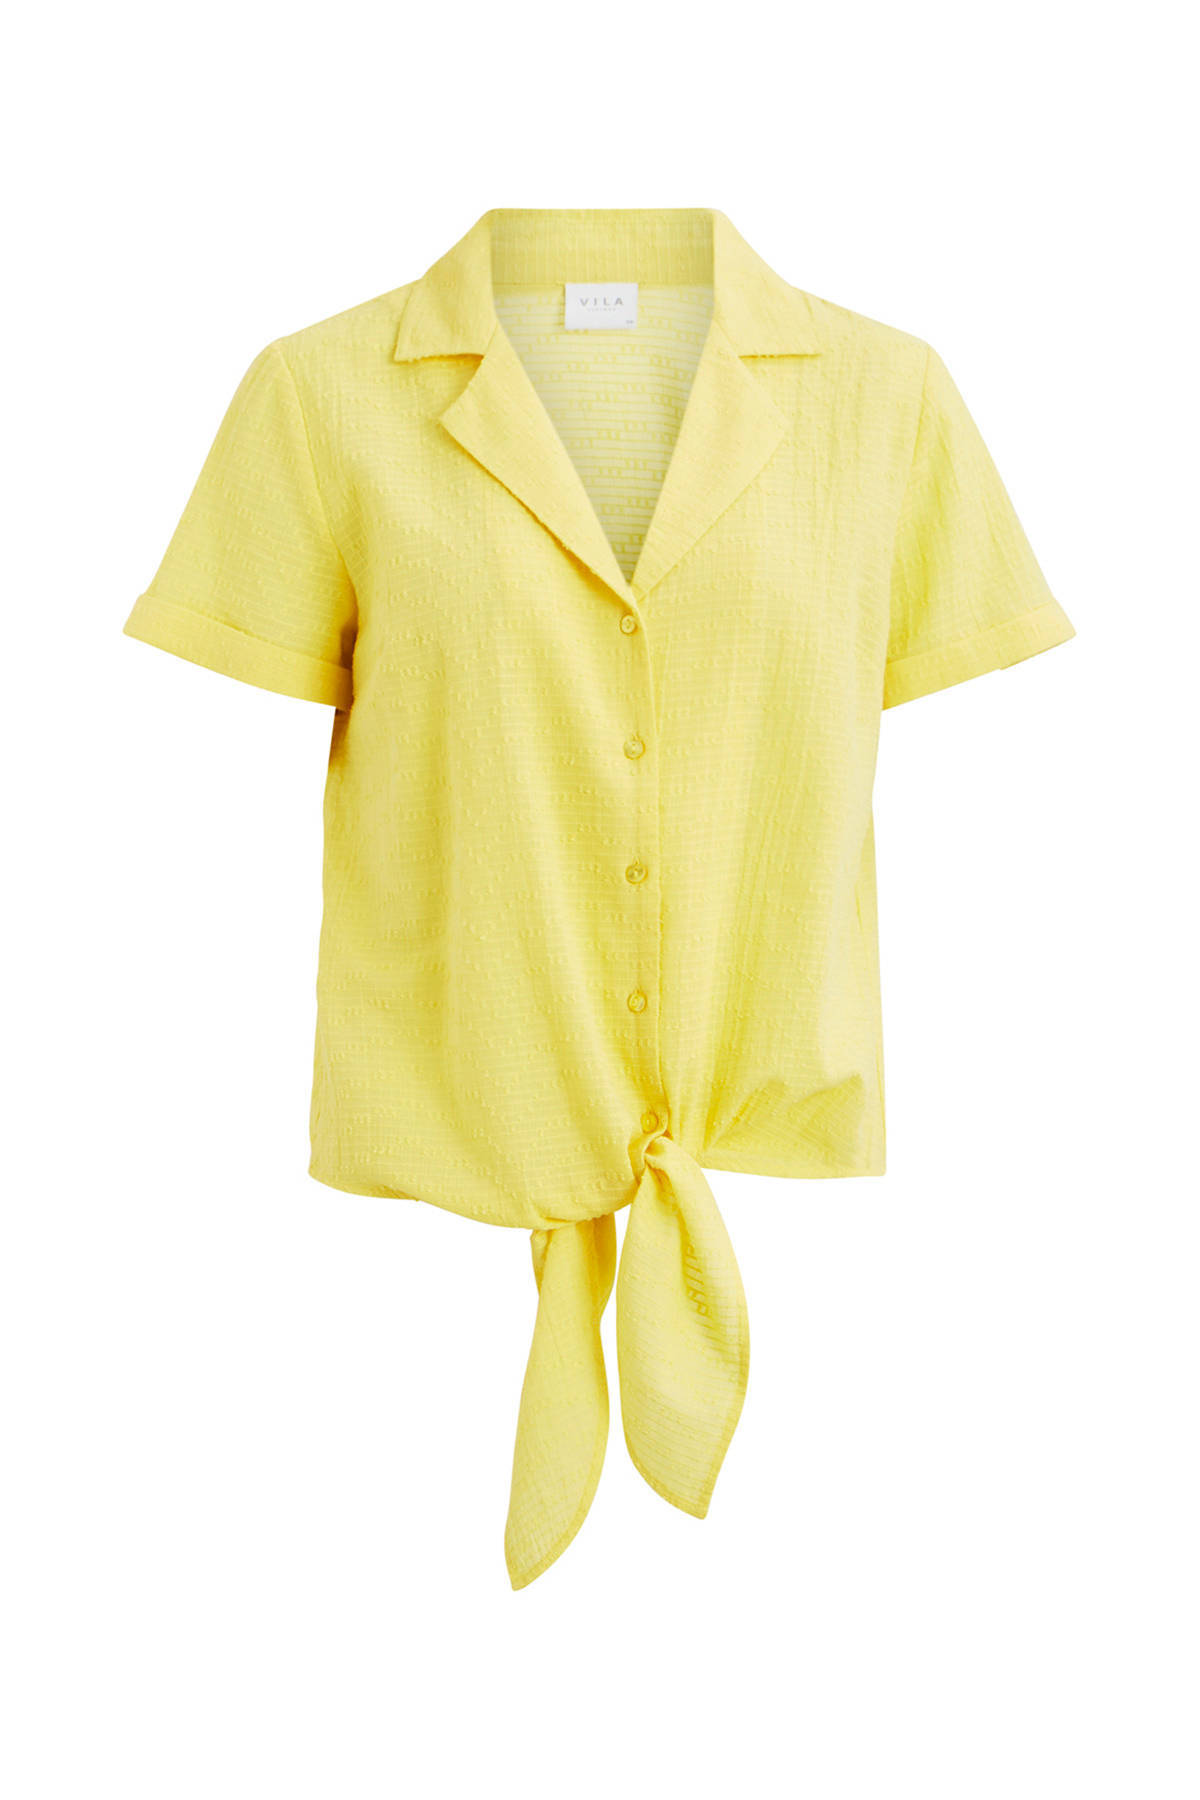 creme kleurige blouse